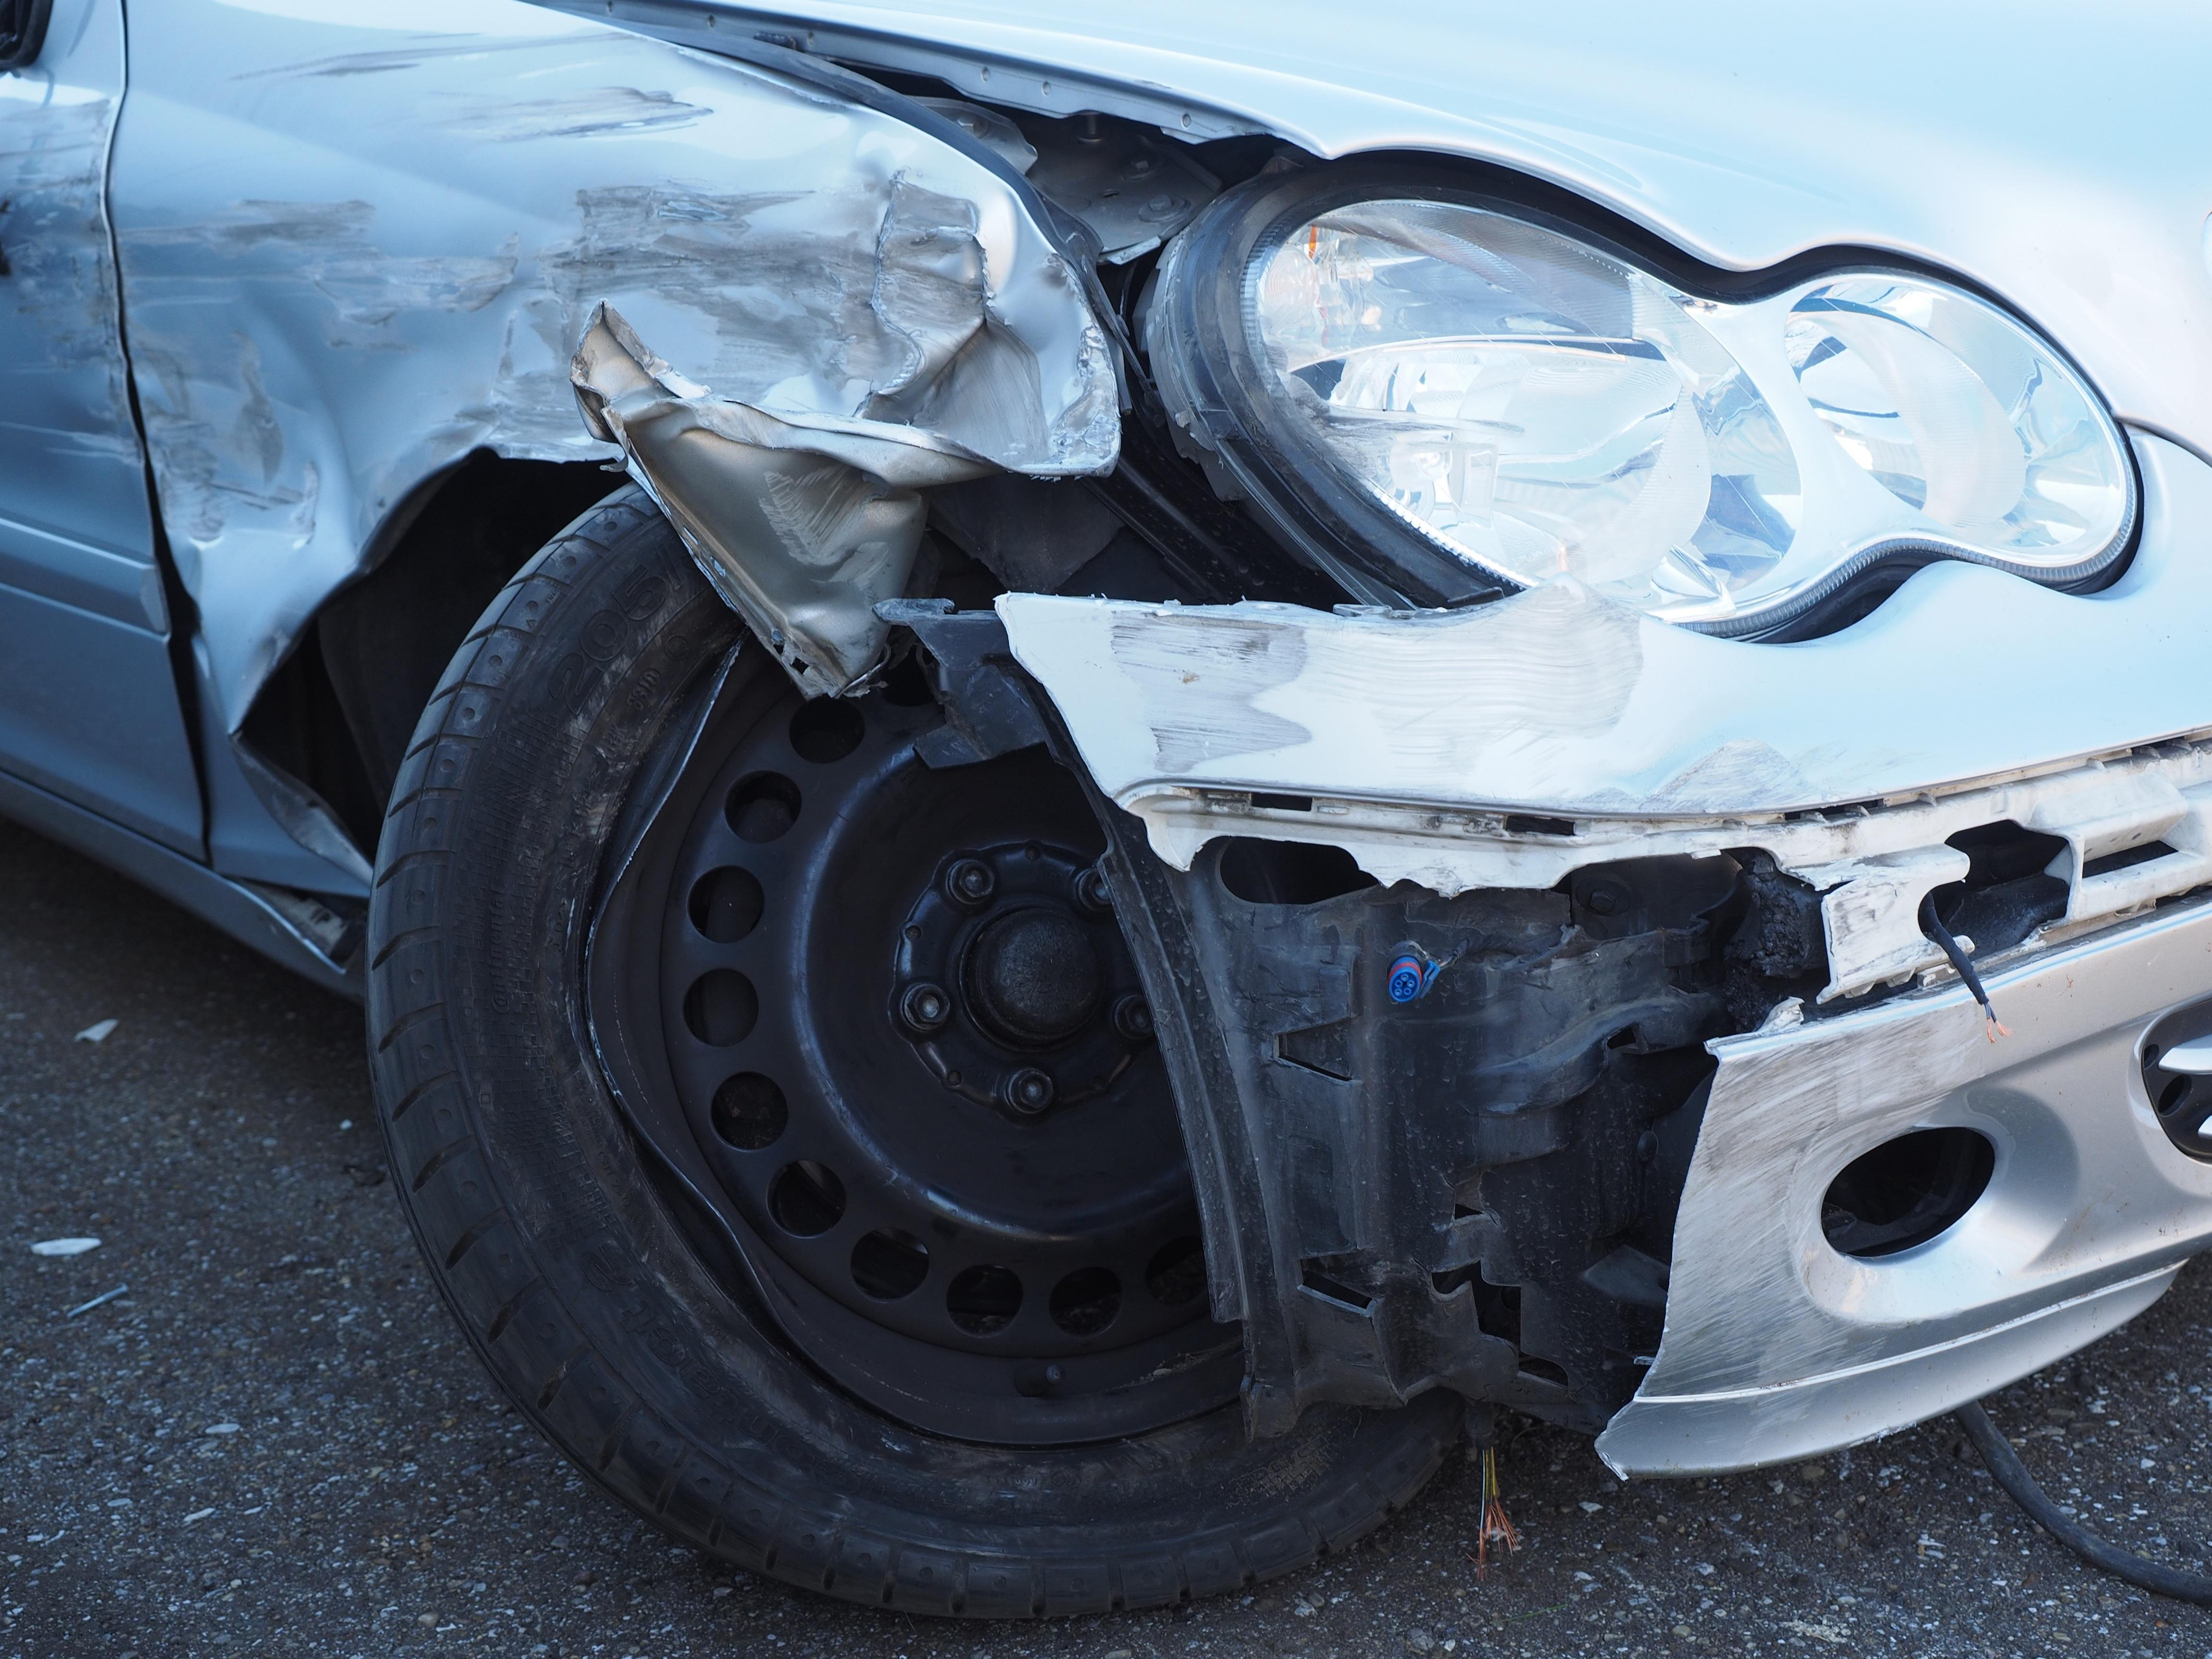 Free Images Wheel Broken Metal Per Sheet Rim Jack Mercedes Daimler Vehicles Bent Demolished Auto Accident Total Damage Part